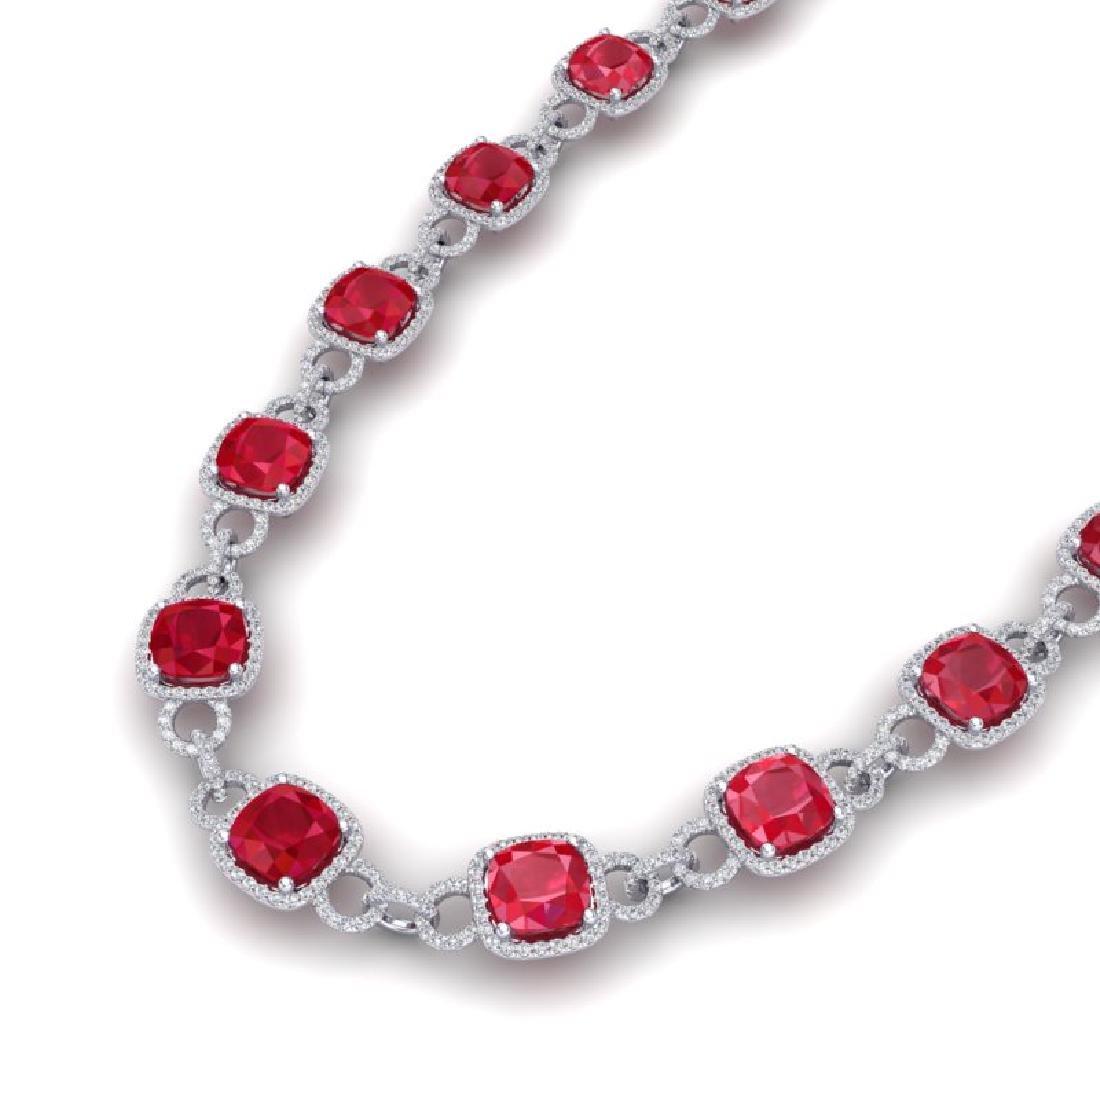 56 CTW Ruby & VS/SI Diamond Necklace 14K White Gold